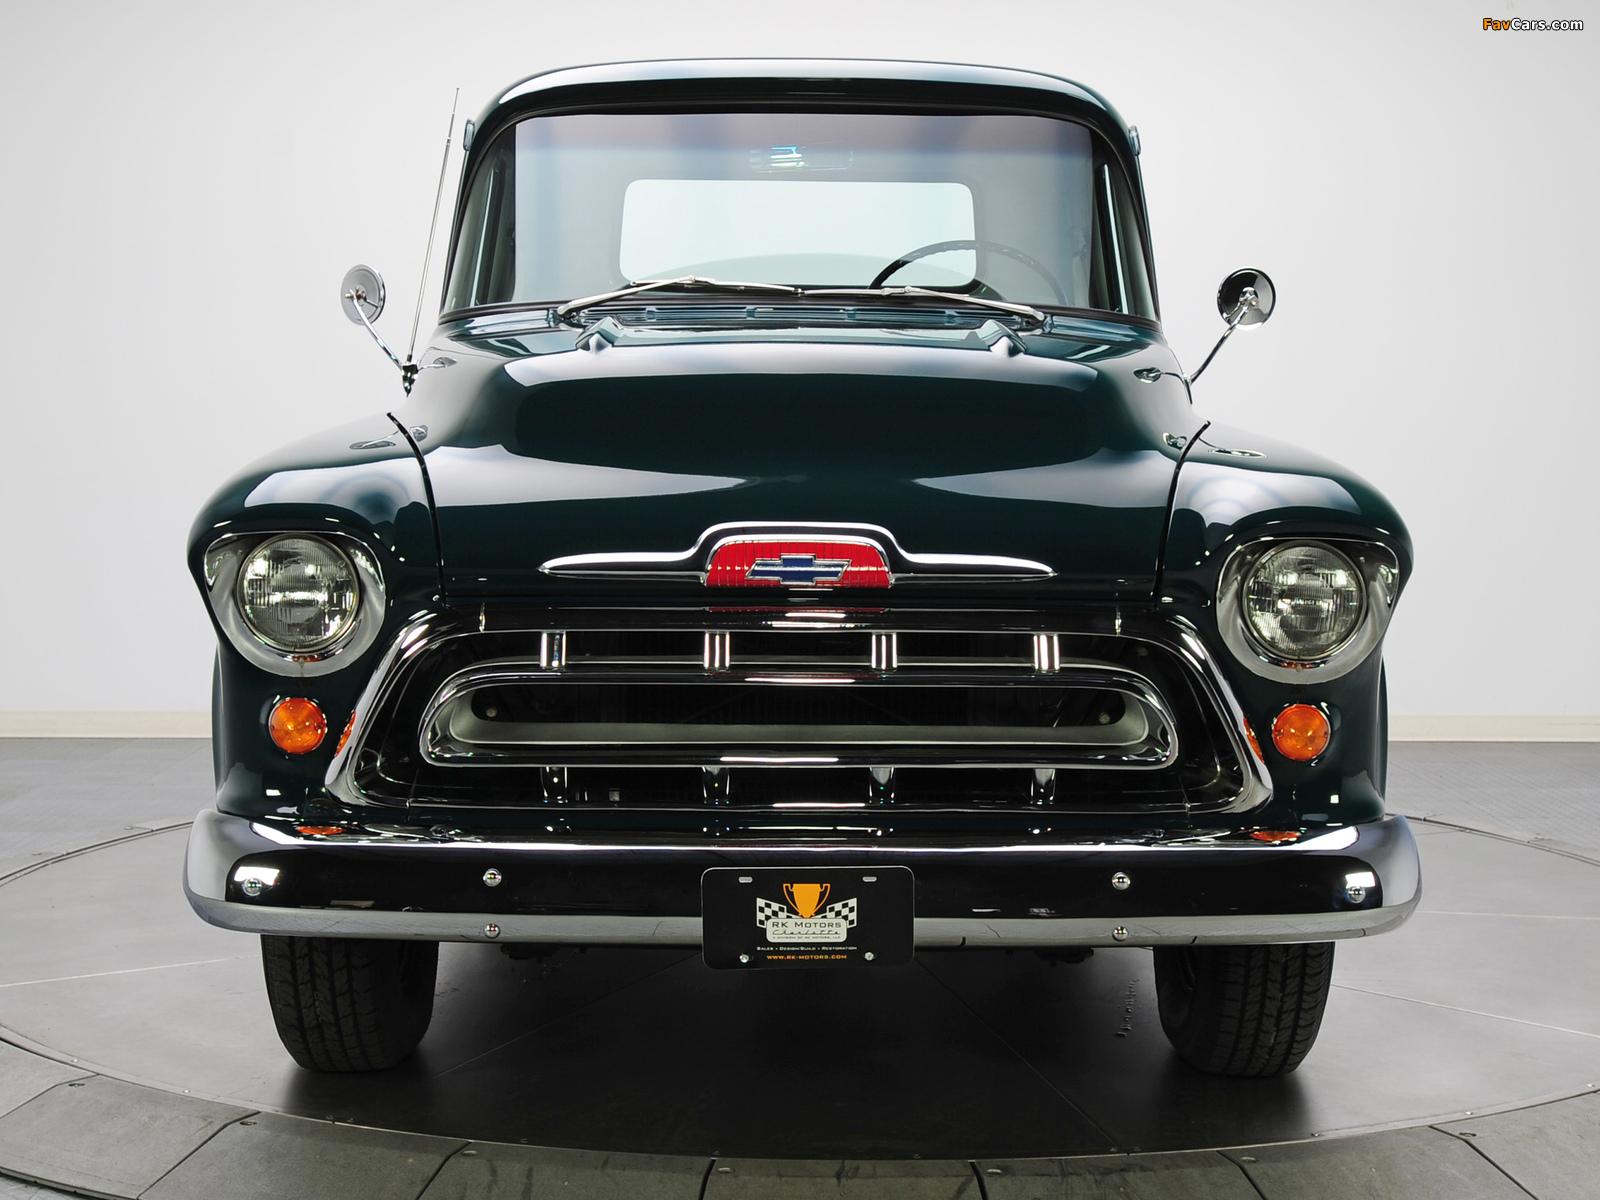 Chevrolet 3100 Stepside Pickup (3A-3104) 1957 images (1600 x 1200)